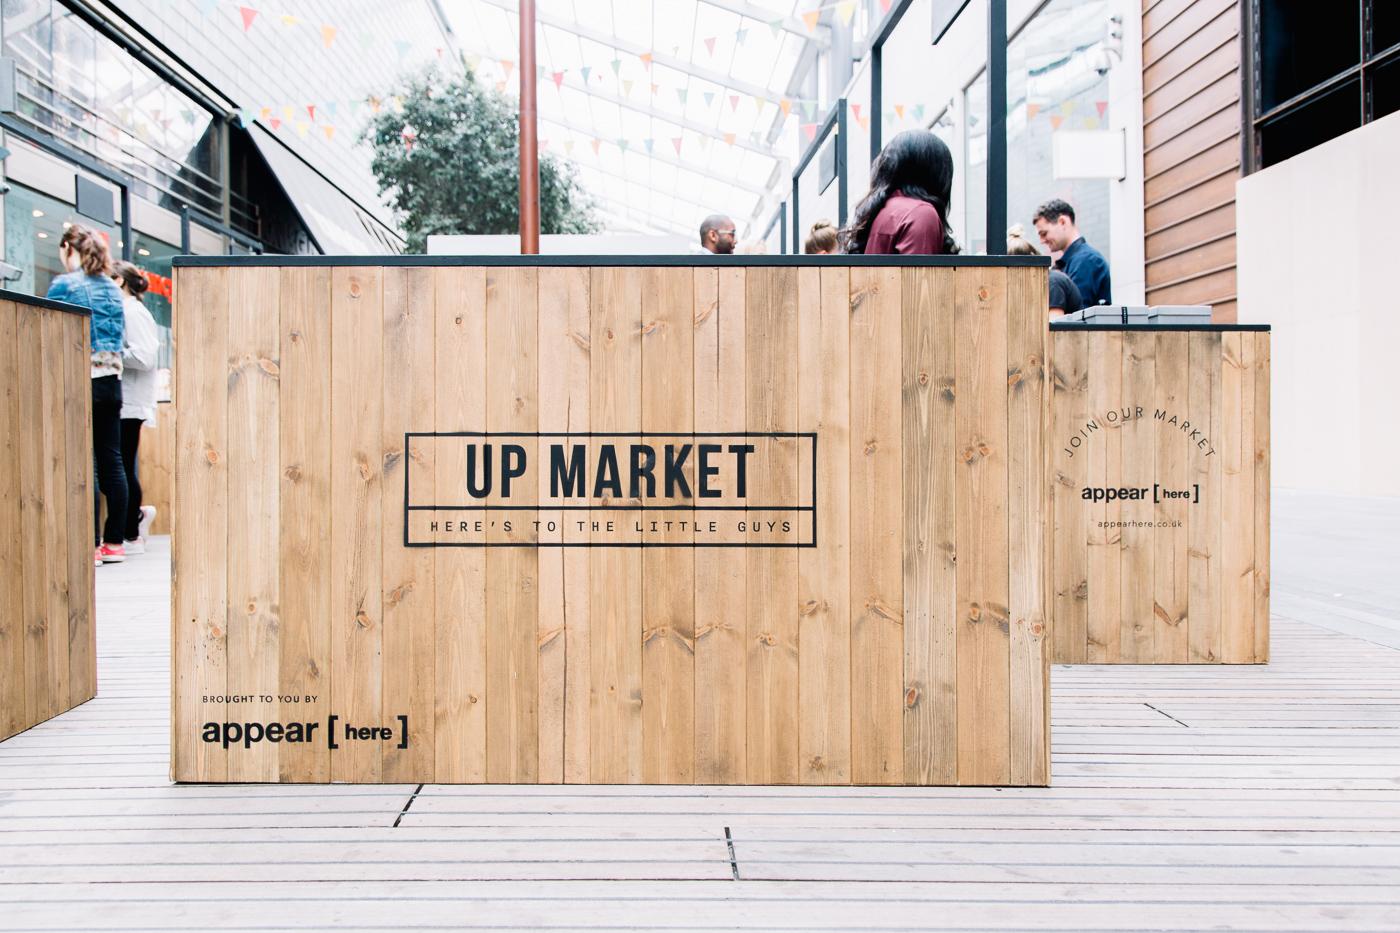 Up Market